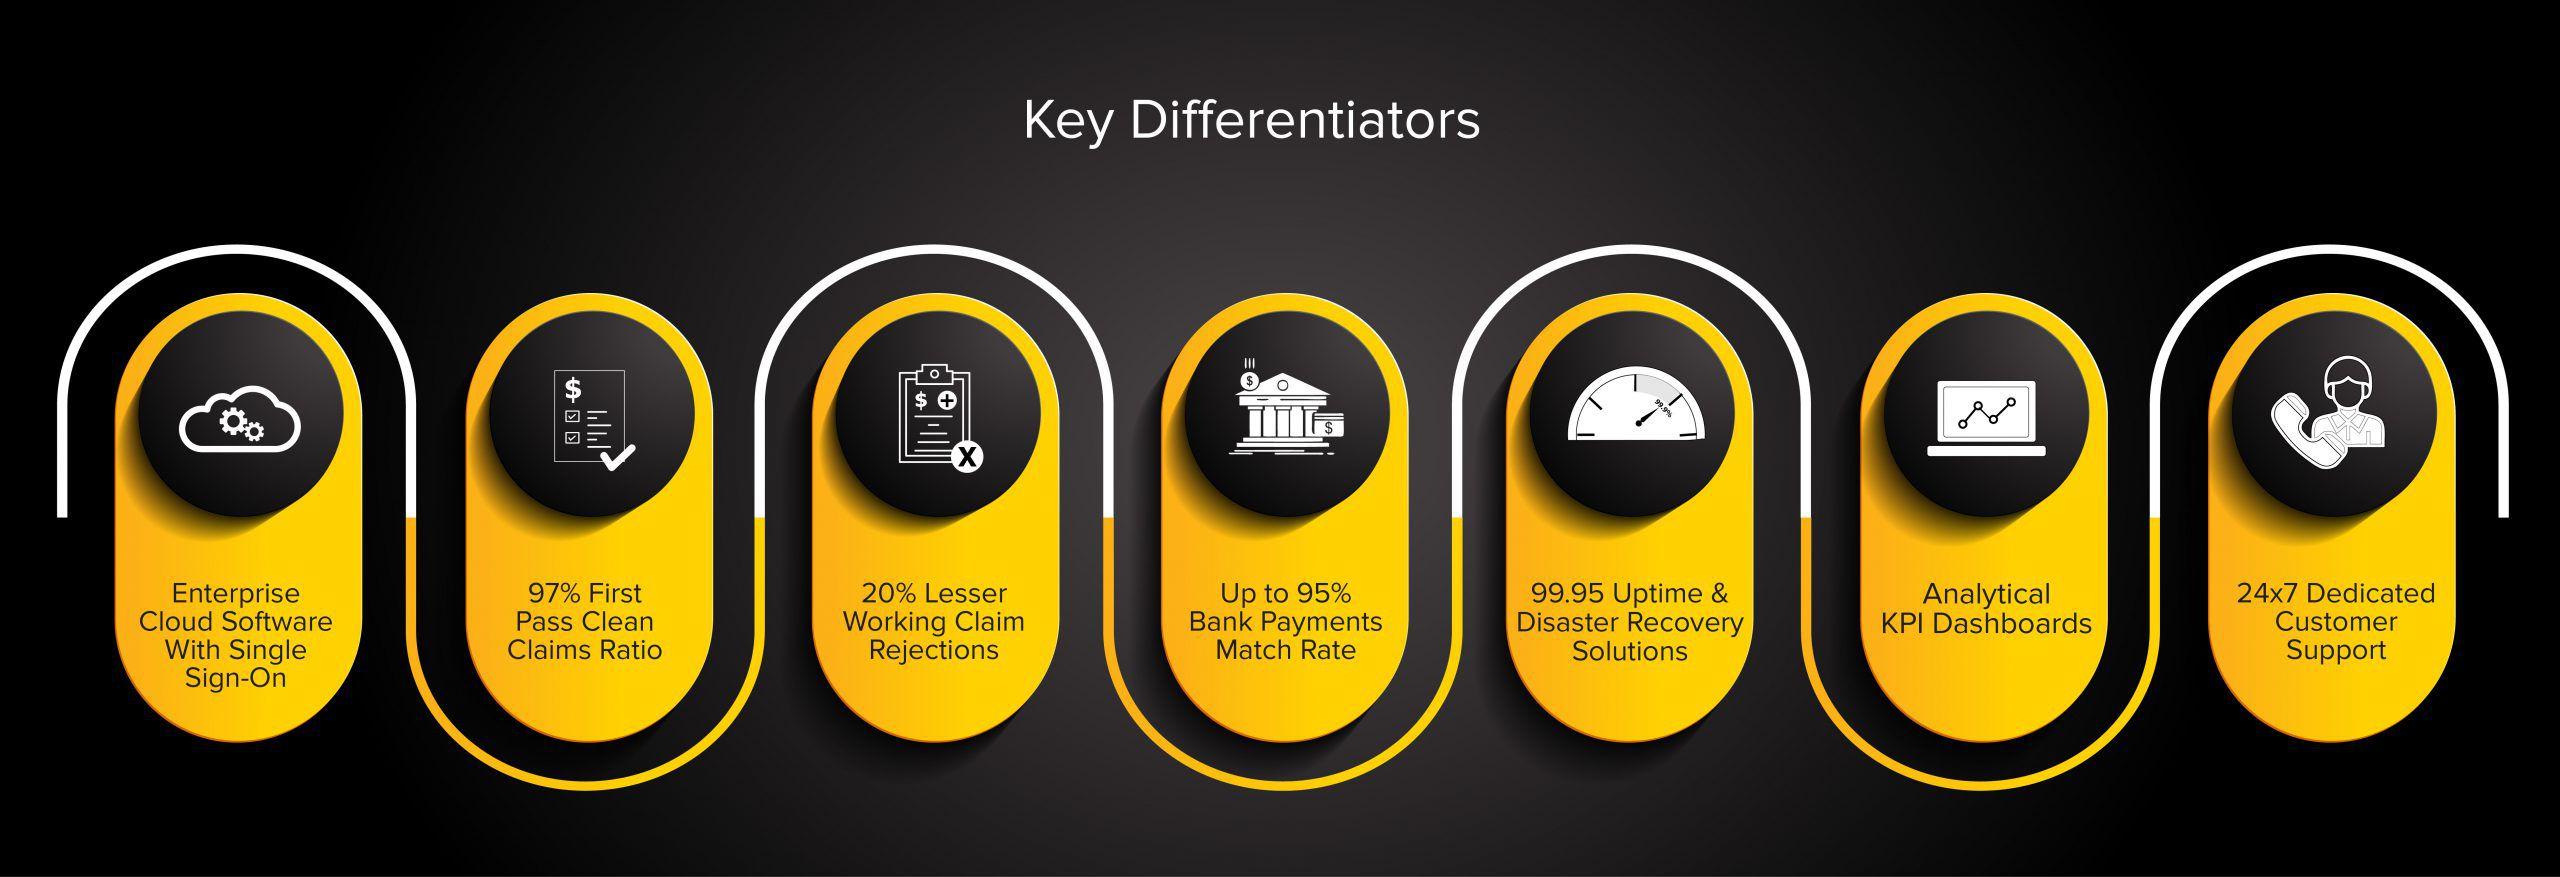 Key Differentiators